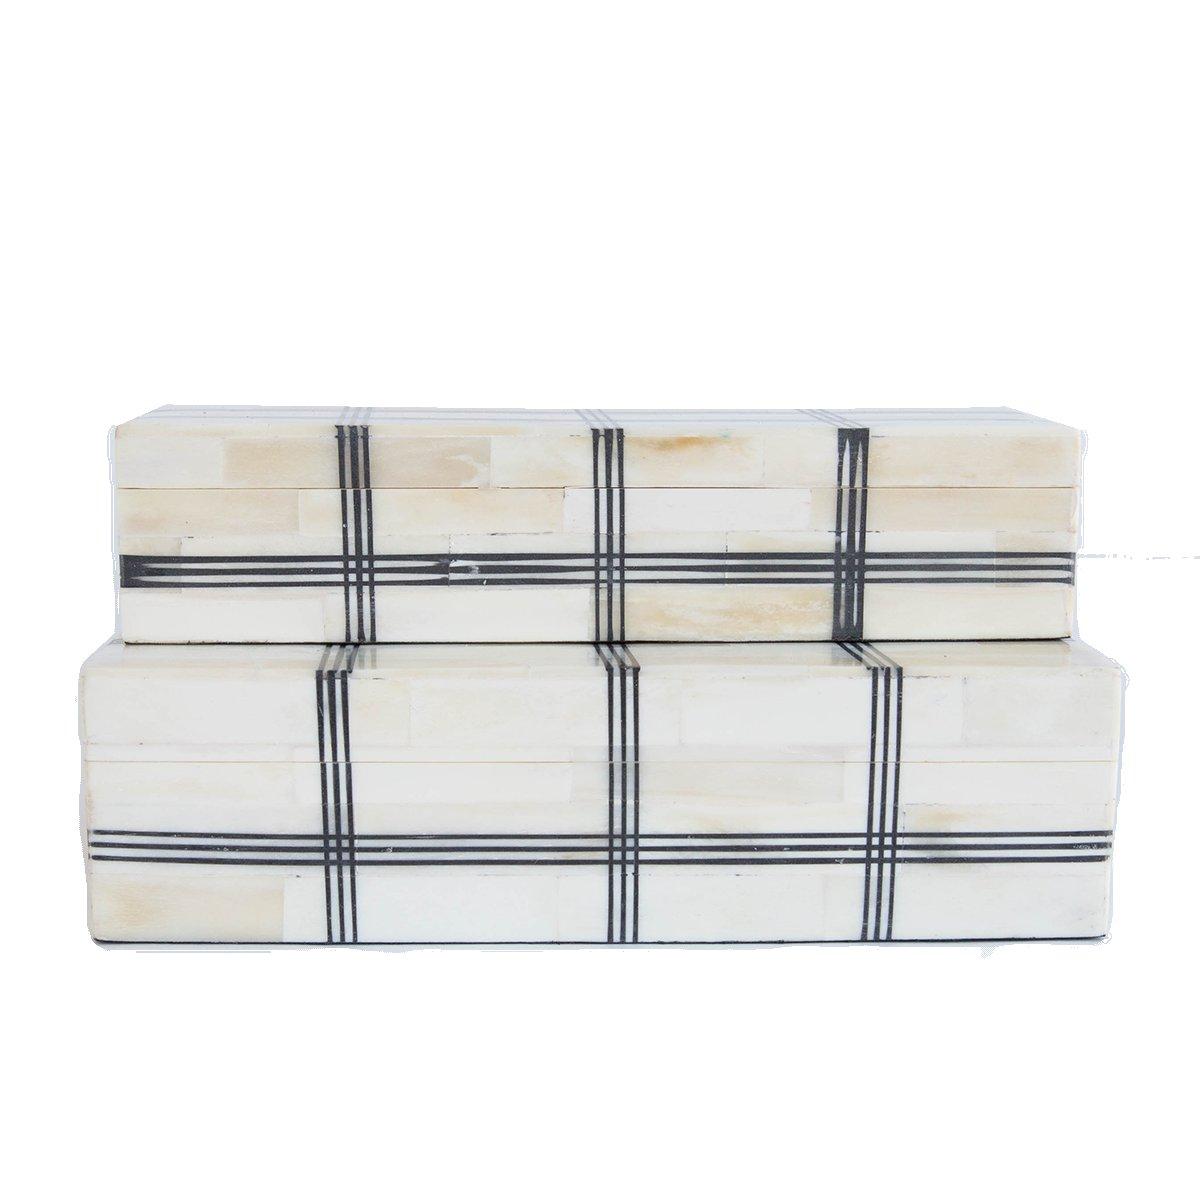 WIDE GRID BOX - SMALL